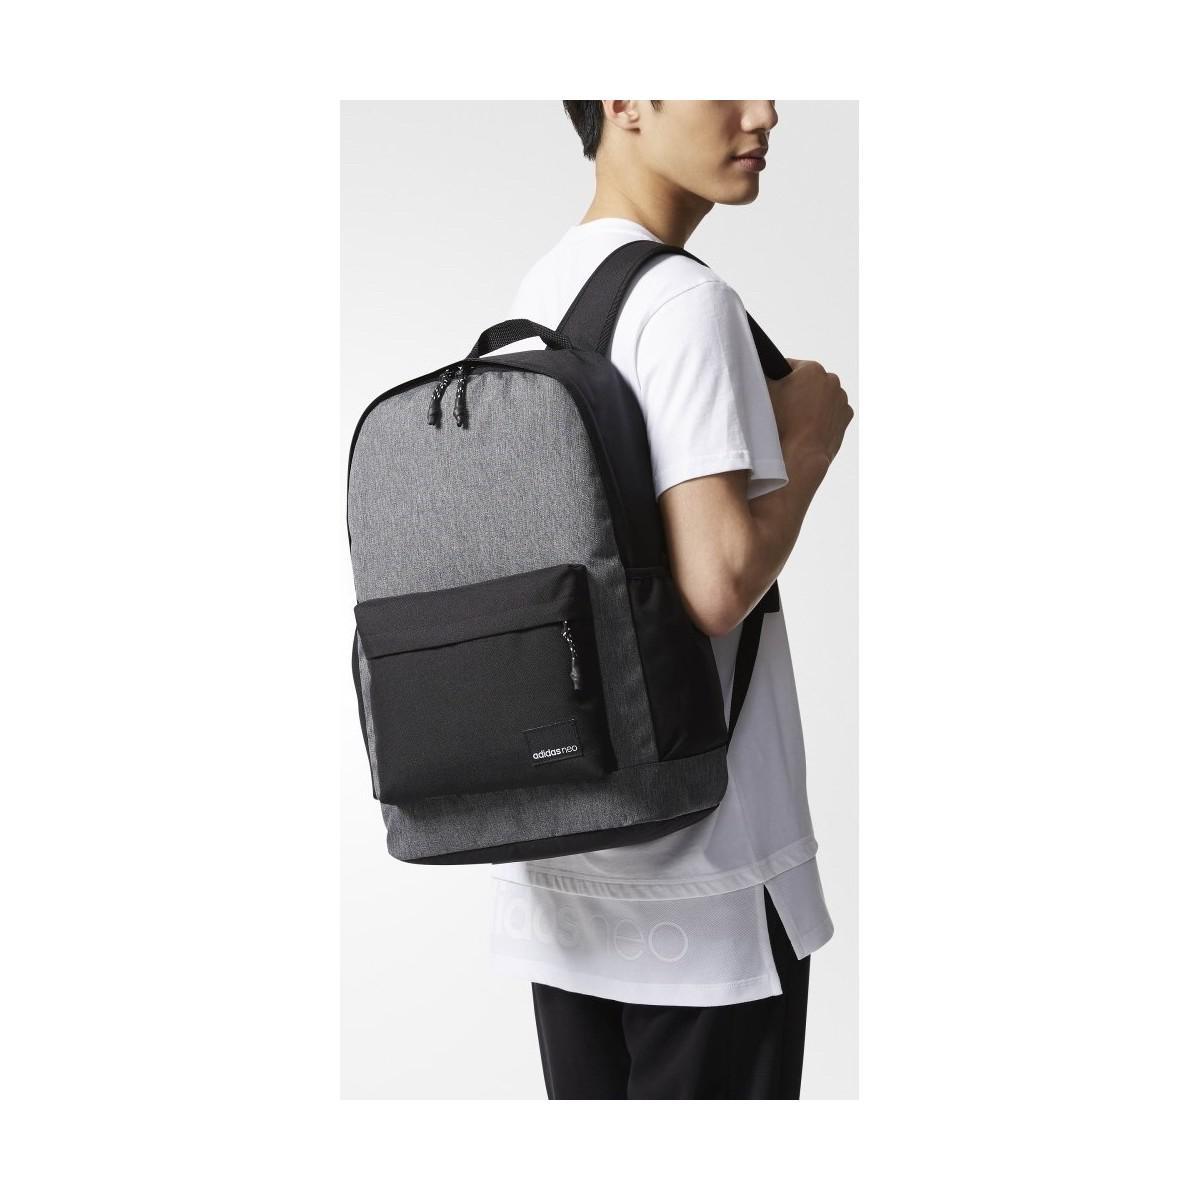 adidas Bp Daily Xl Men's Backpack In Grey in Grey for Men